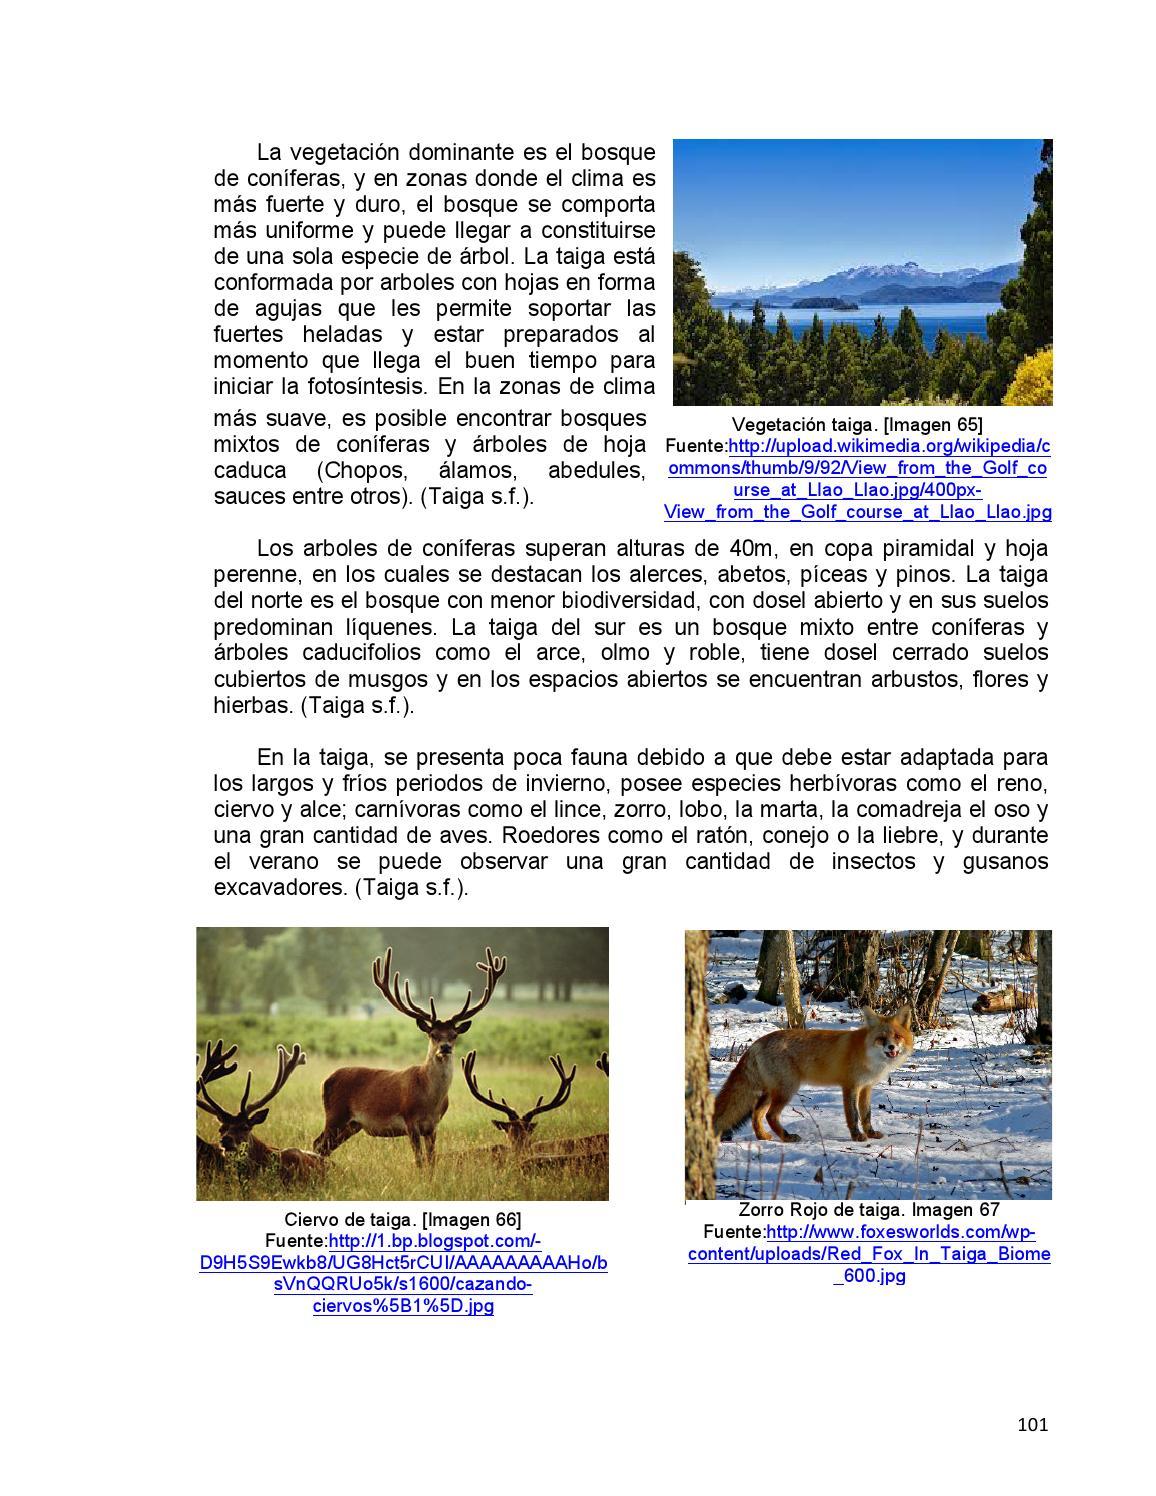 Tesis 0410 i c by maosabo issuu for Diferencia entre arboles de hoja caduca y hoja perenne